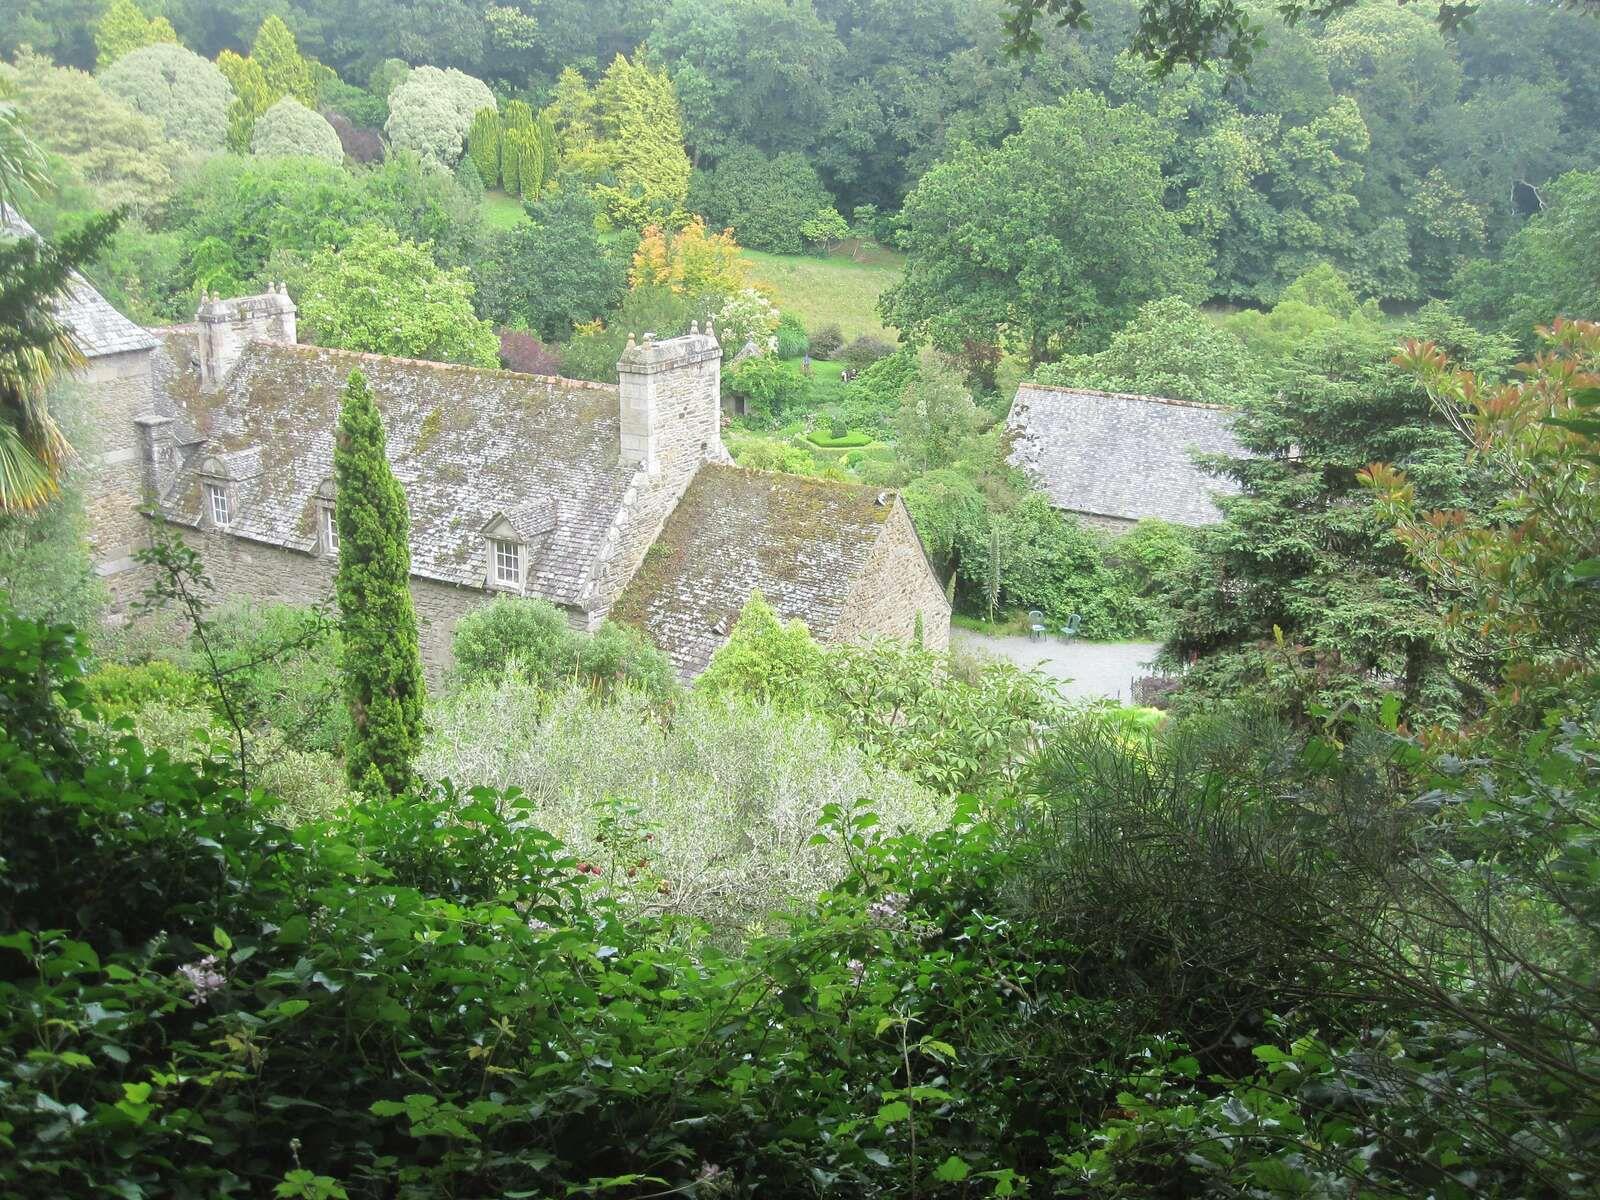 Les jardins bretons (1)